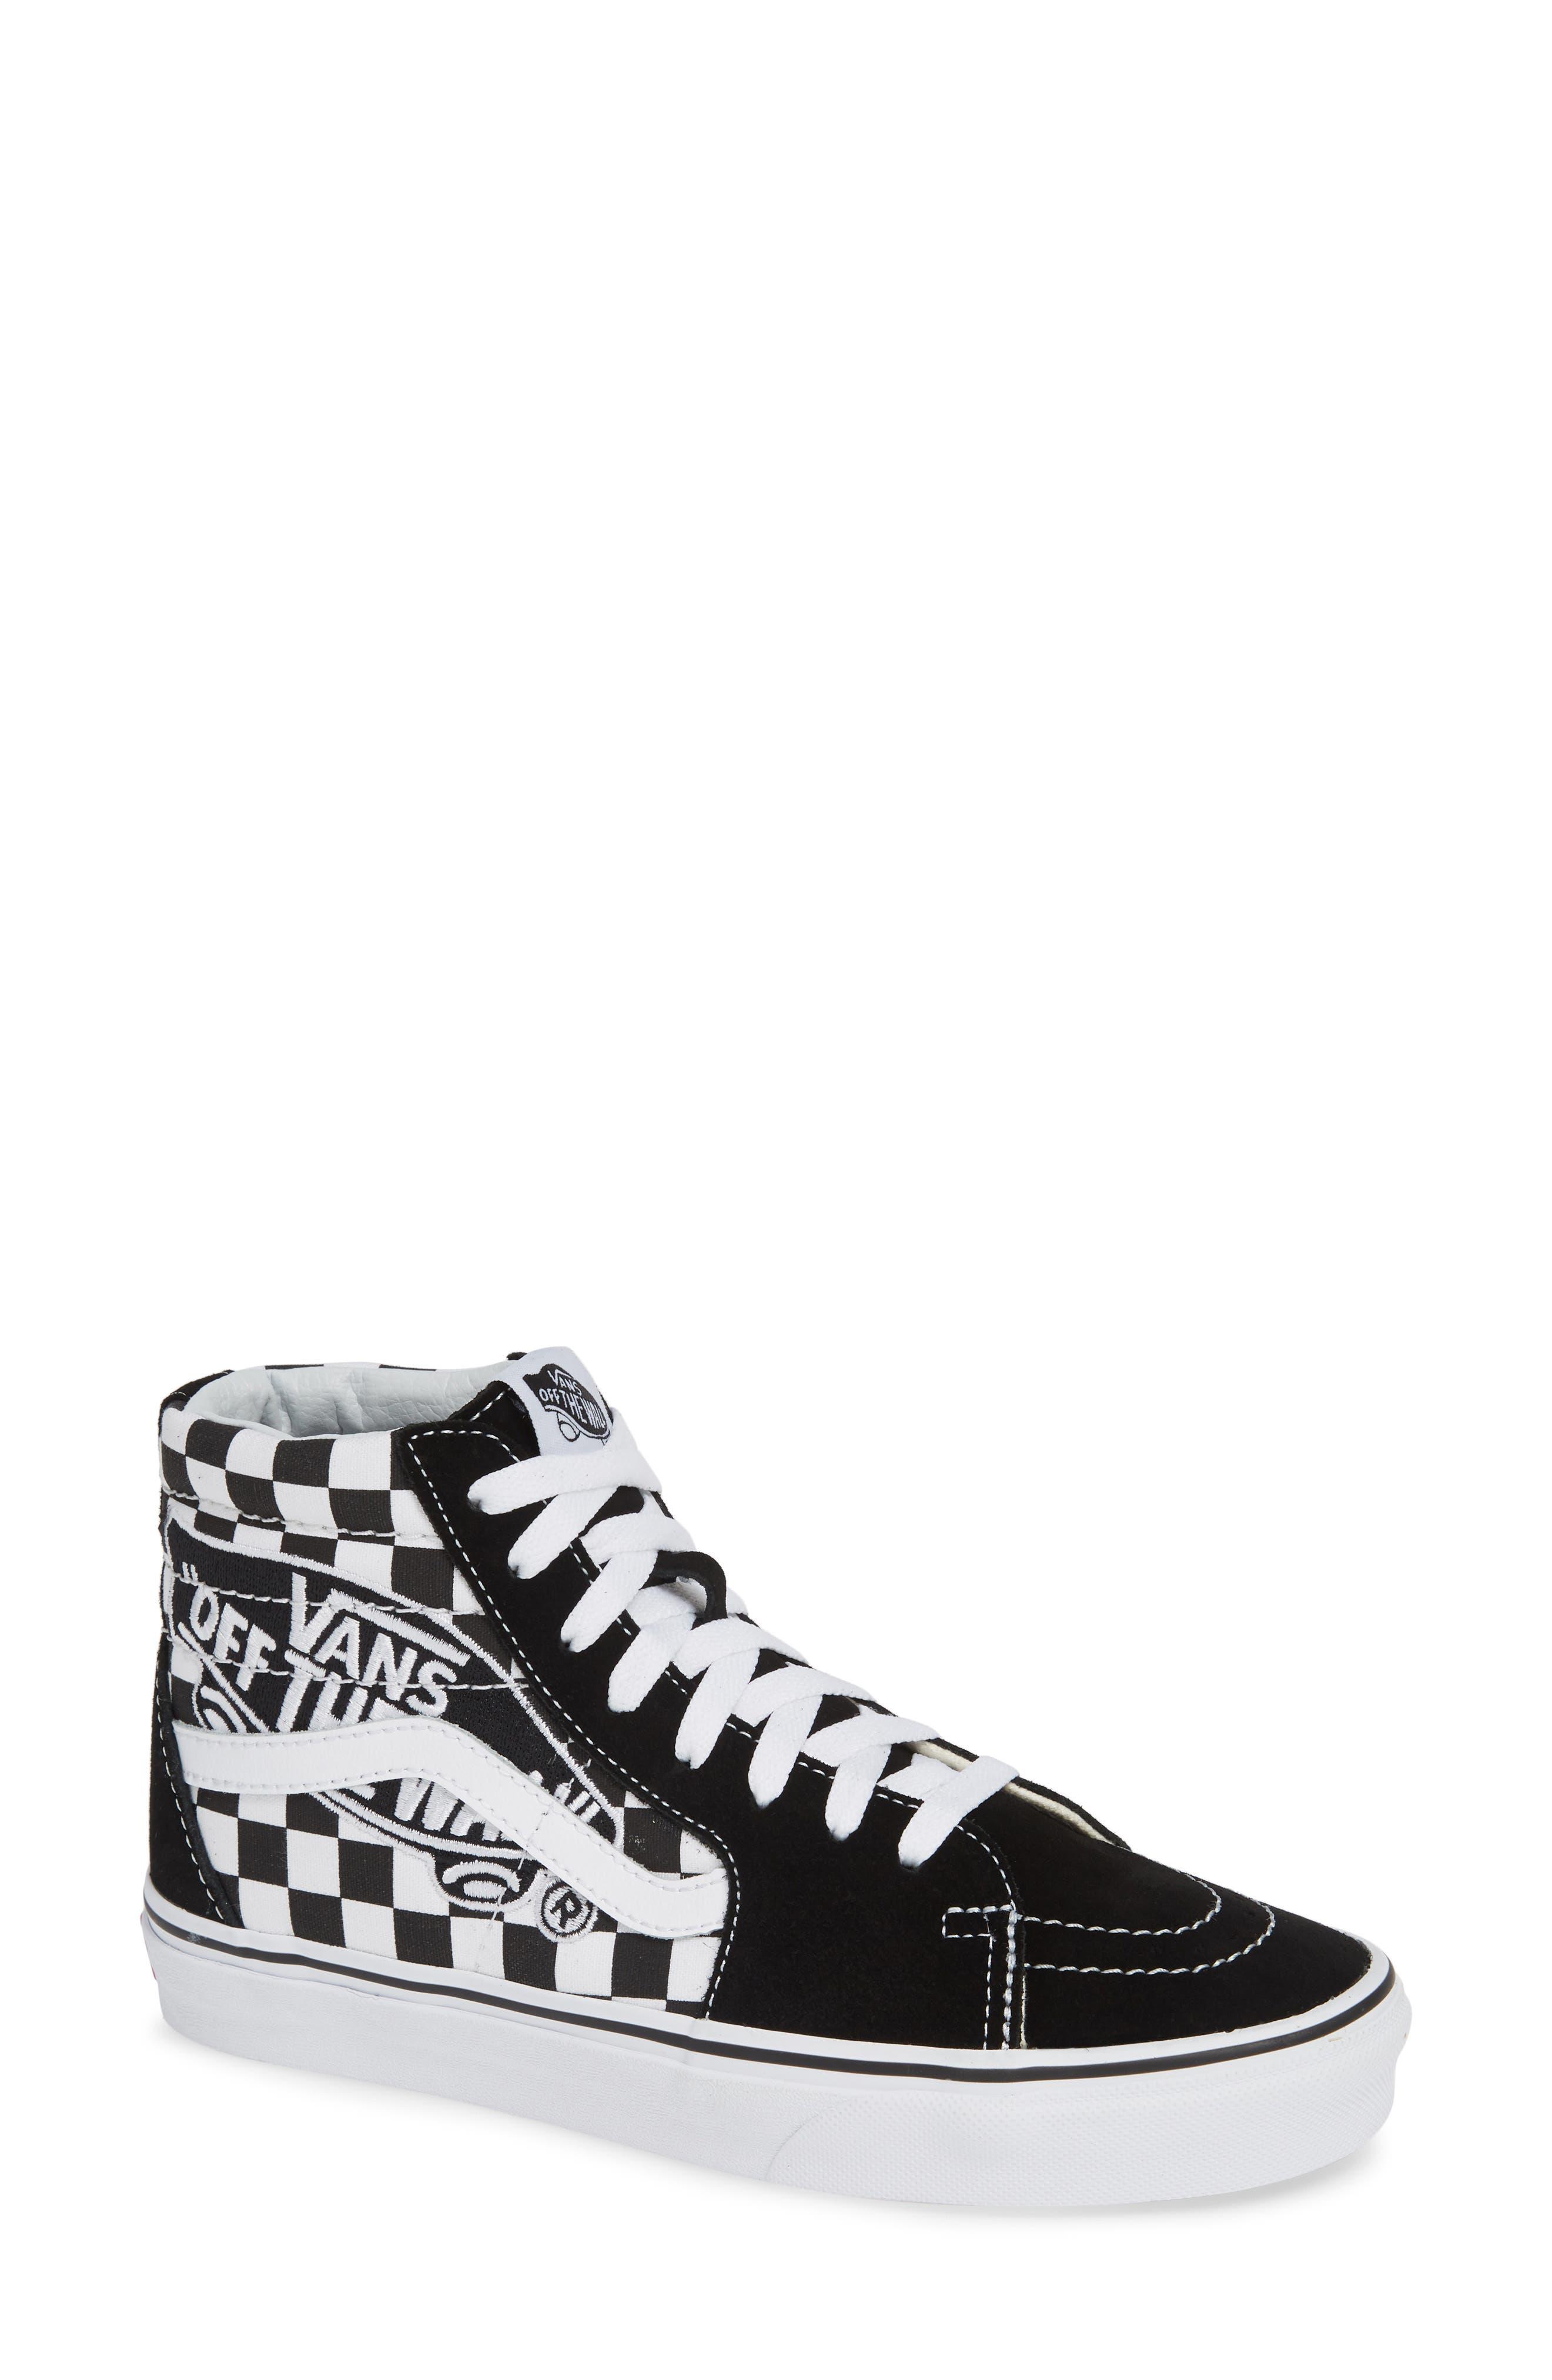 Sk8-Hi Patch High Top Sneaker,                             Main thumbnail 1, color,                             BLACK/ TRUE WHITE